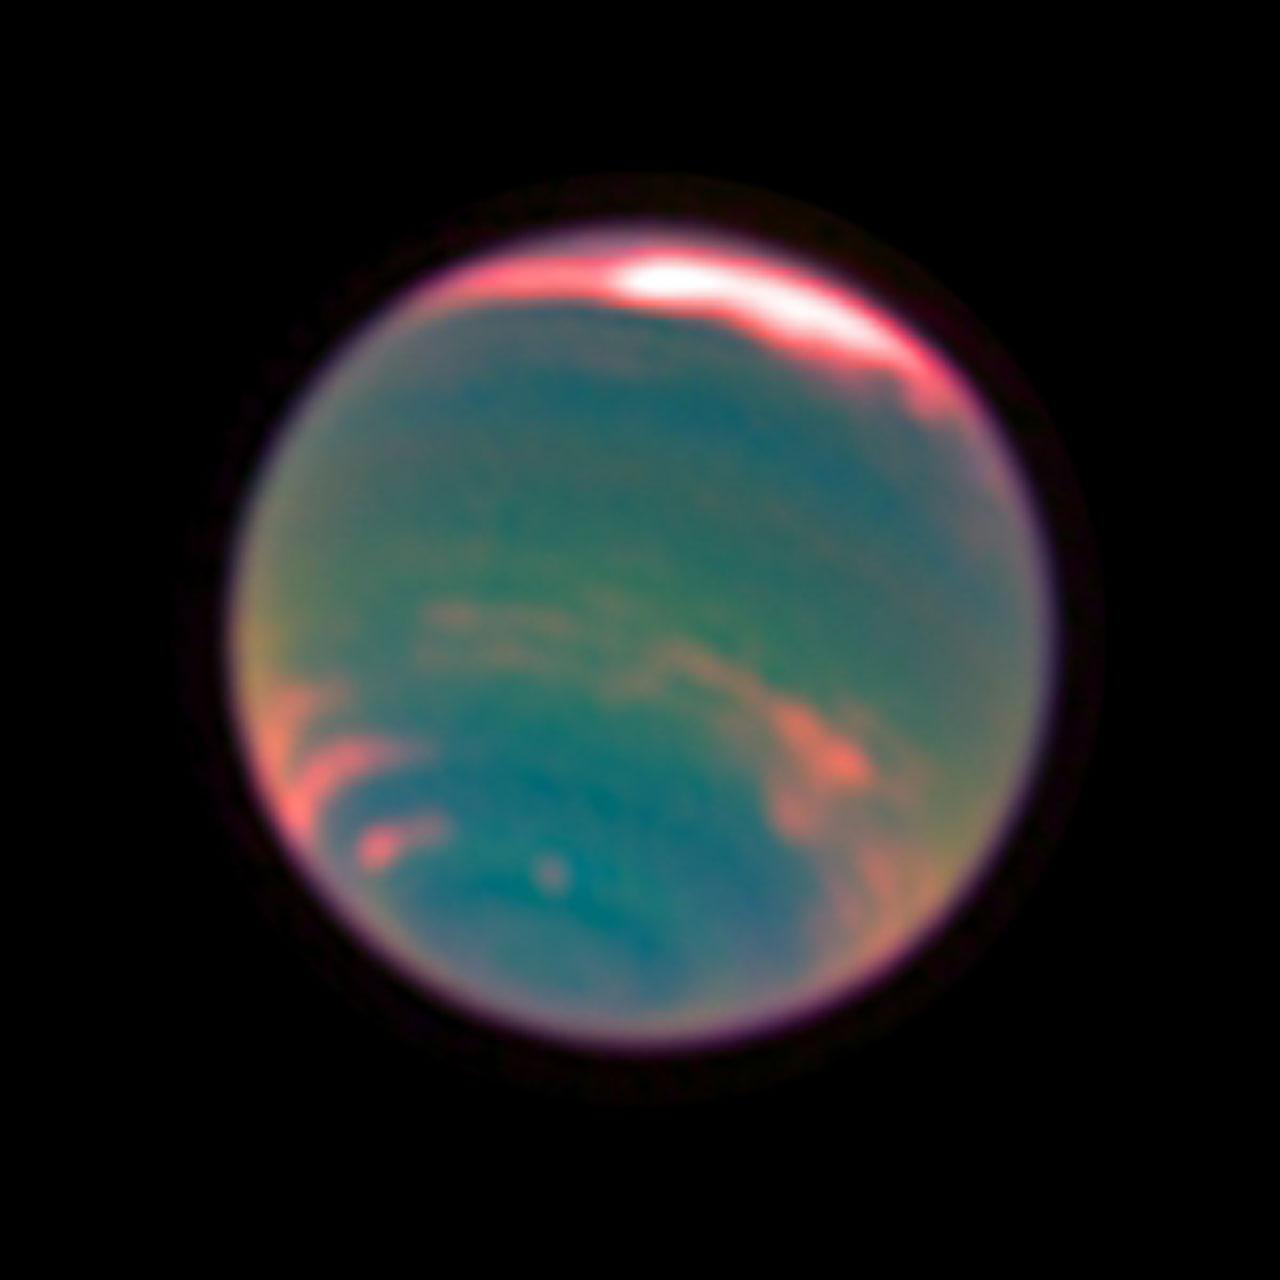 Neptune Methane Band Esa Hubble